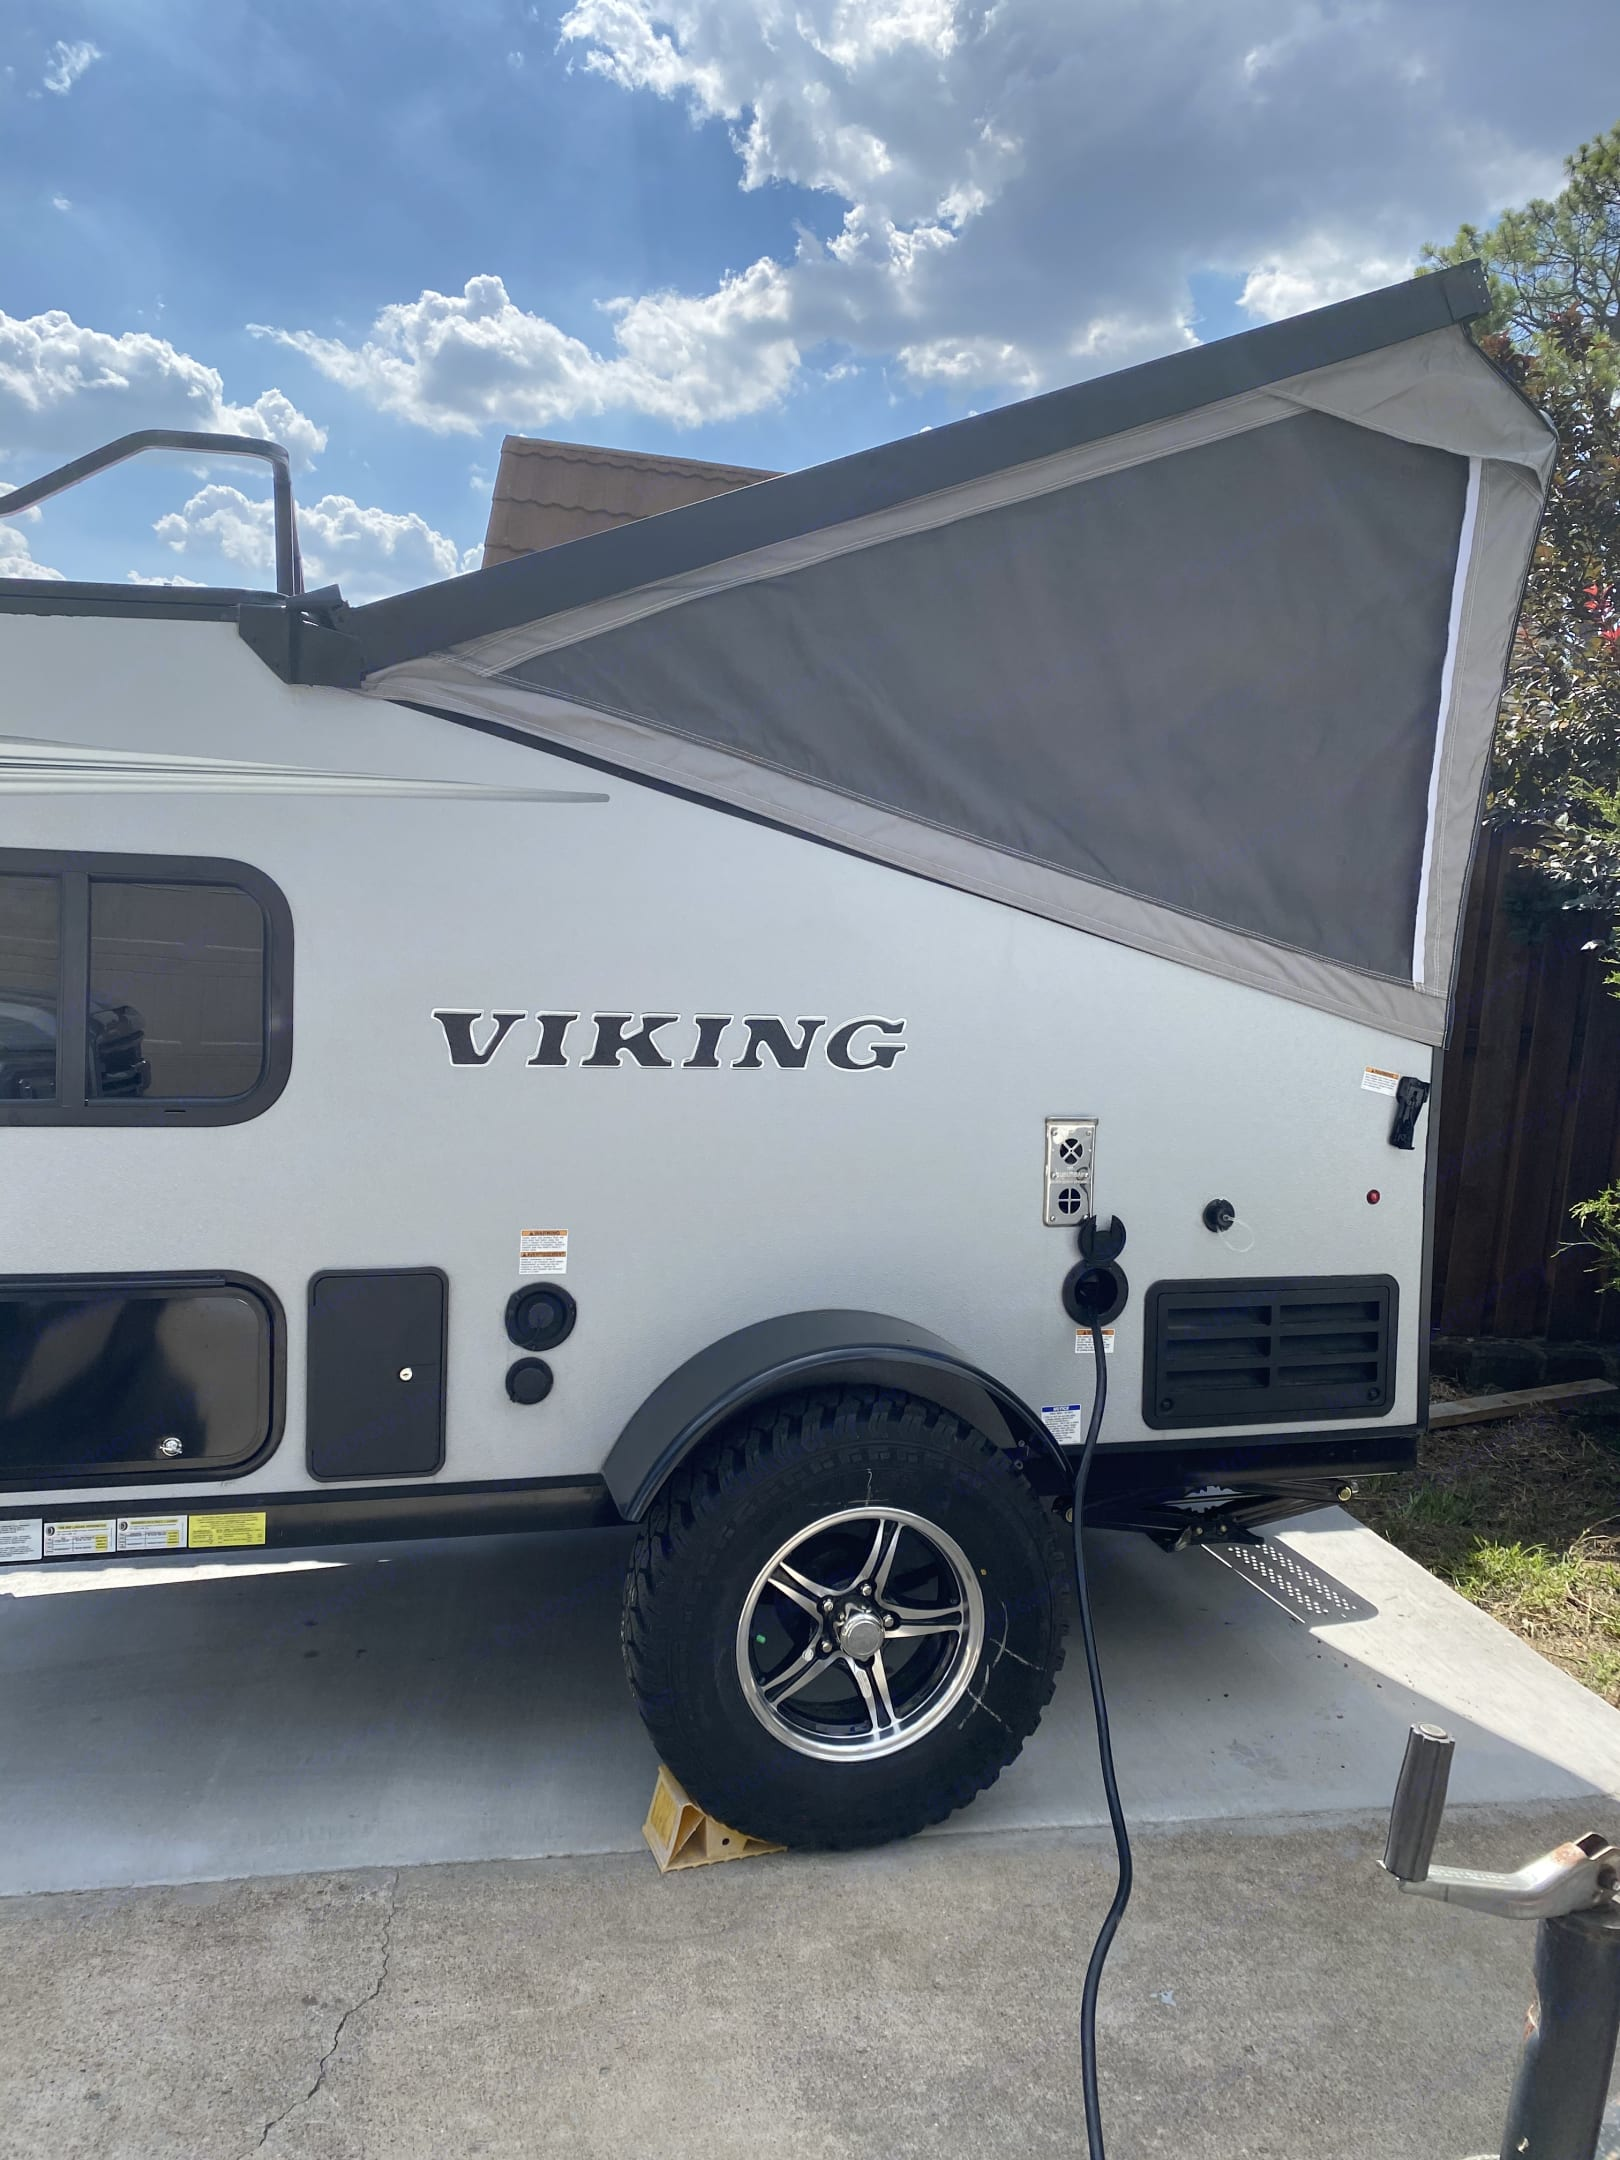 Viking VikingExpress 2020